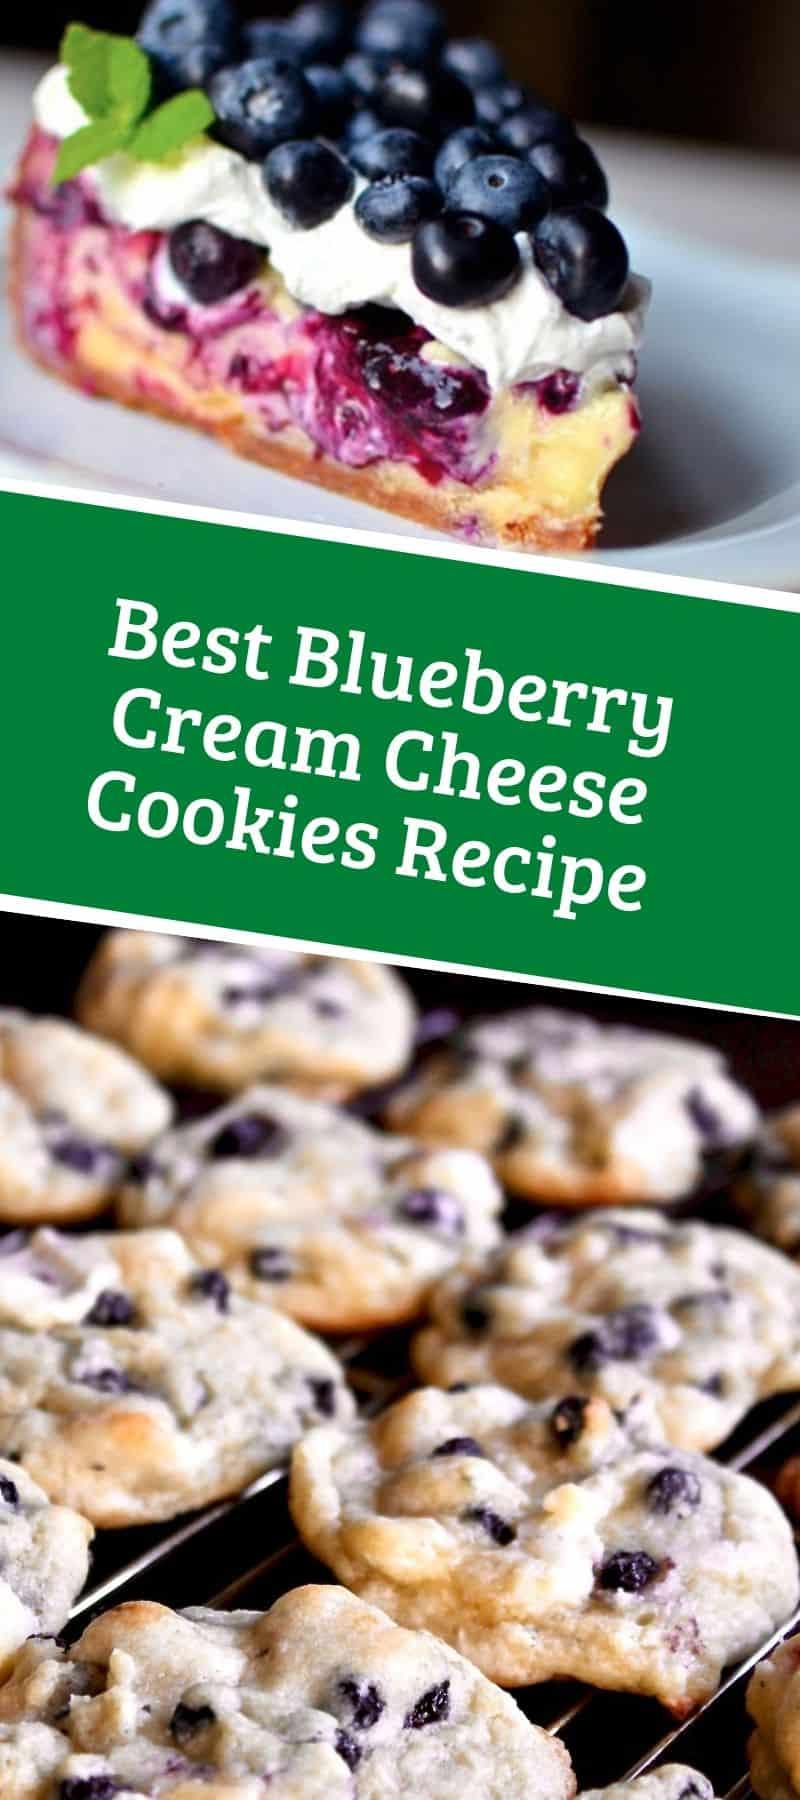 Best Blueberry Cream Cheese Cookies Recipe